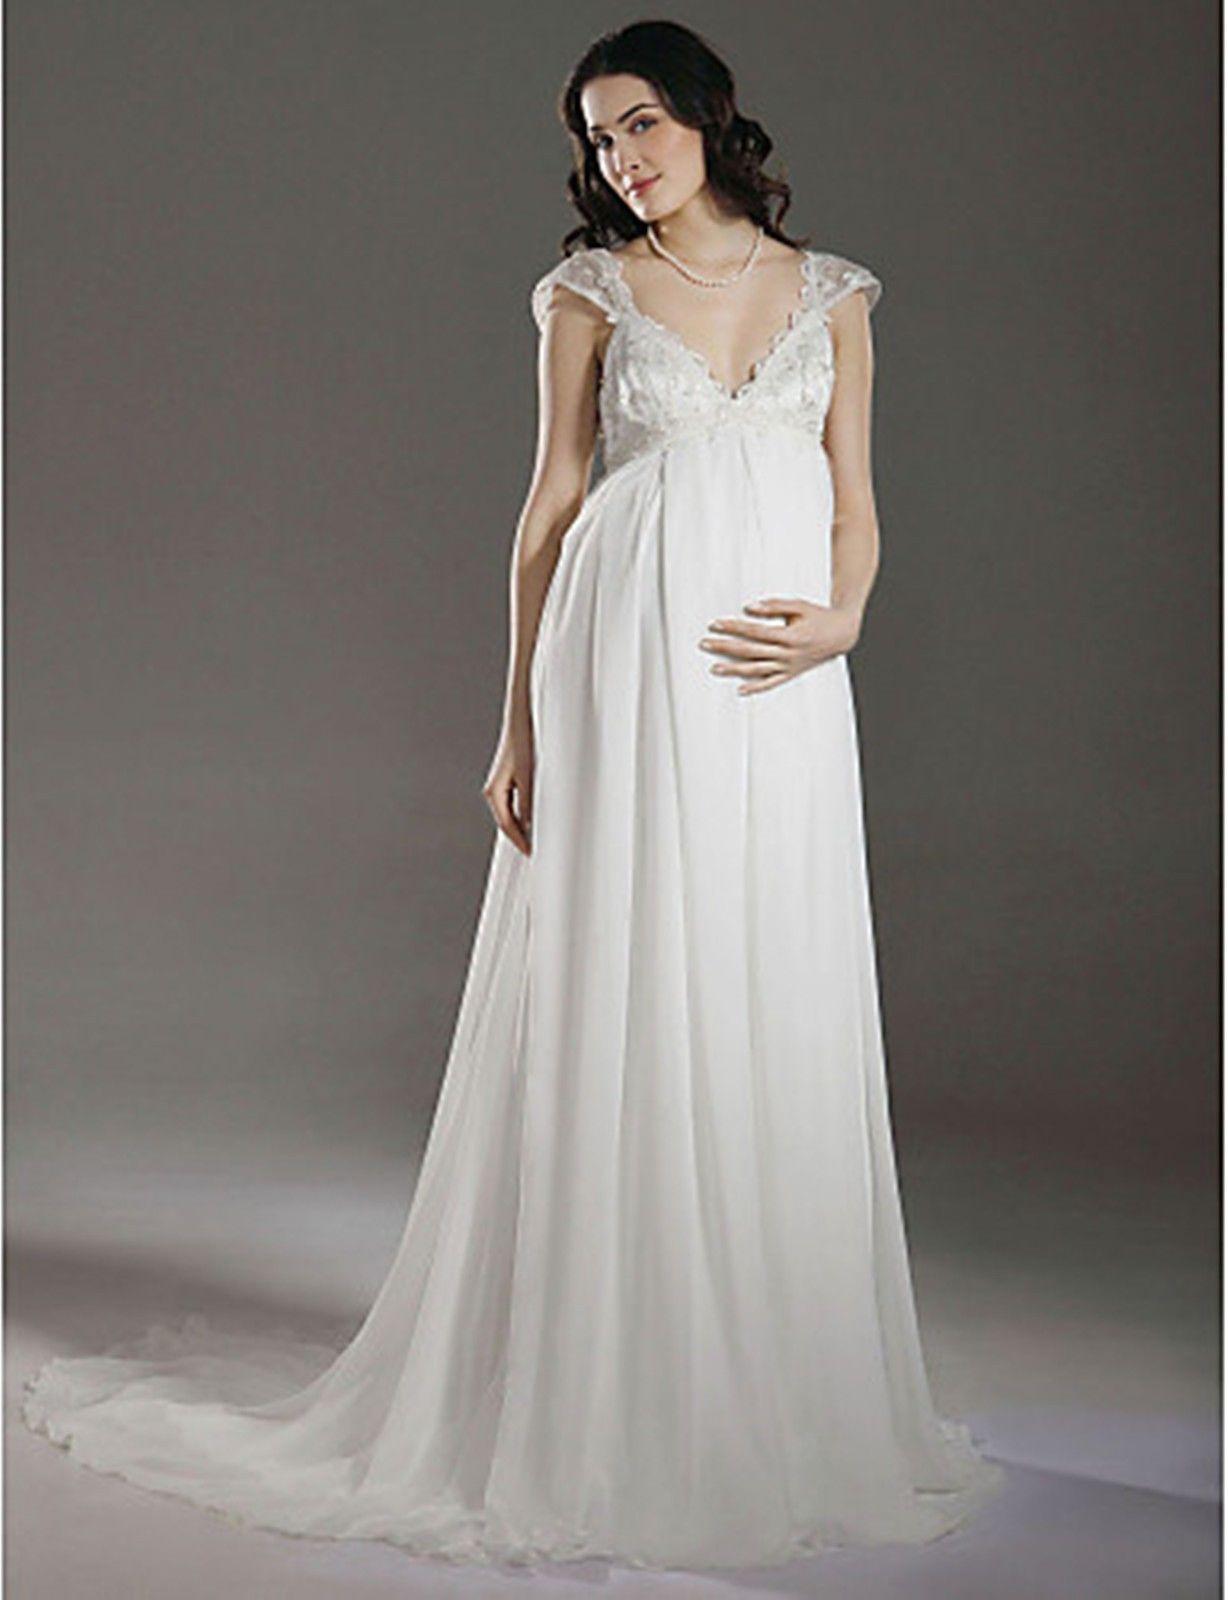 Tehu šaty - Obrázok č. 4